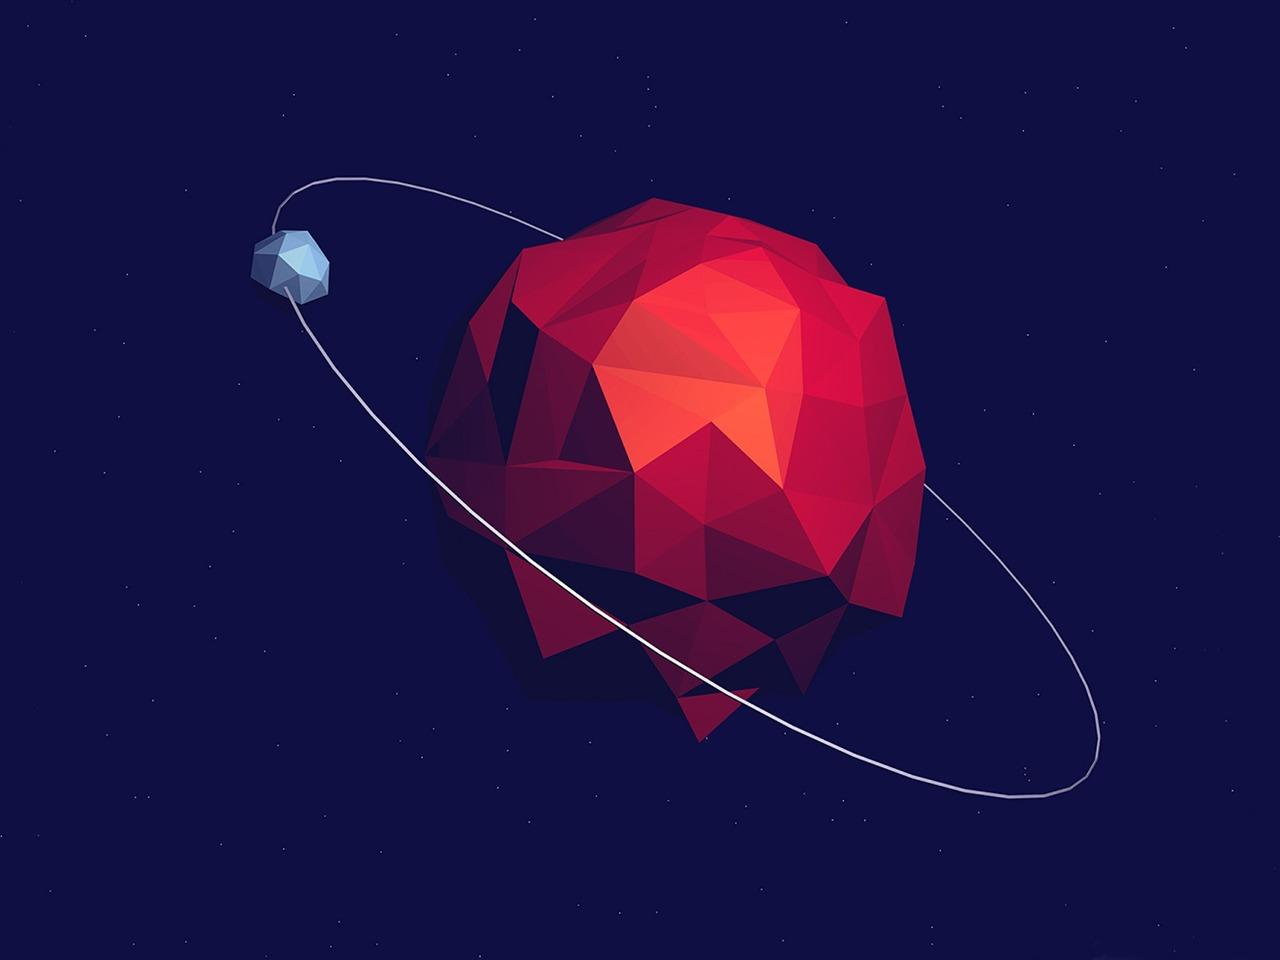 Abstract Planet Vector Art Design Hd Wallpaper Preview